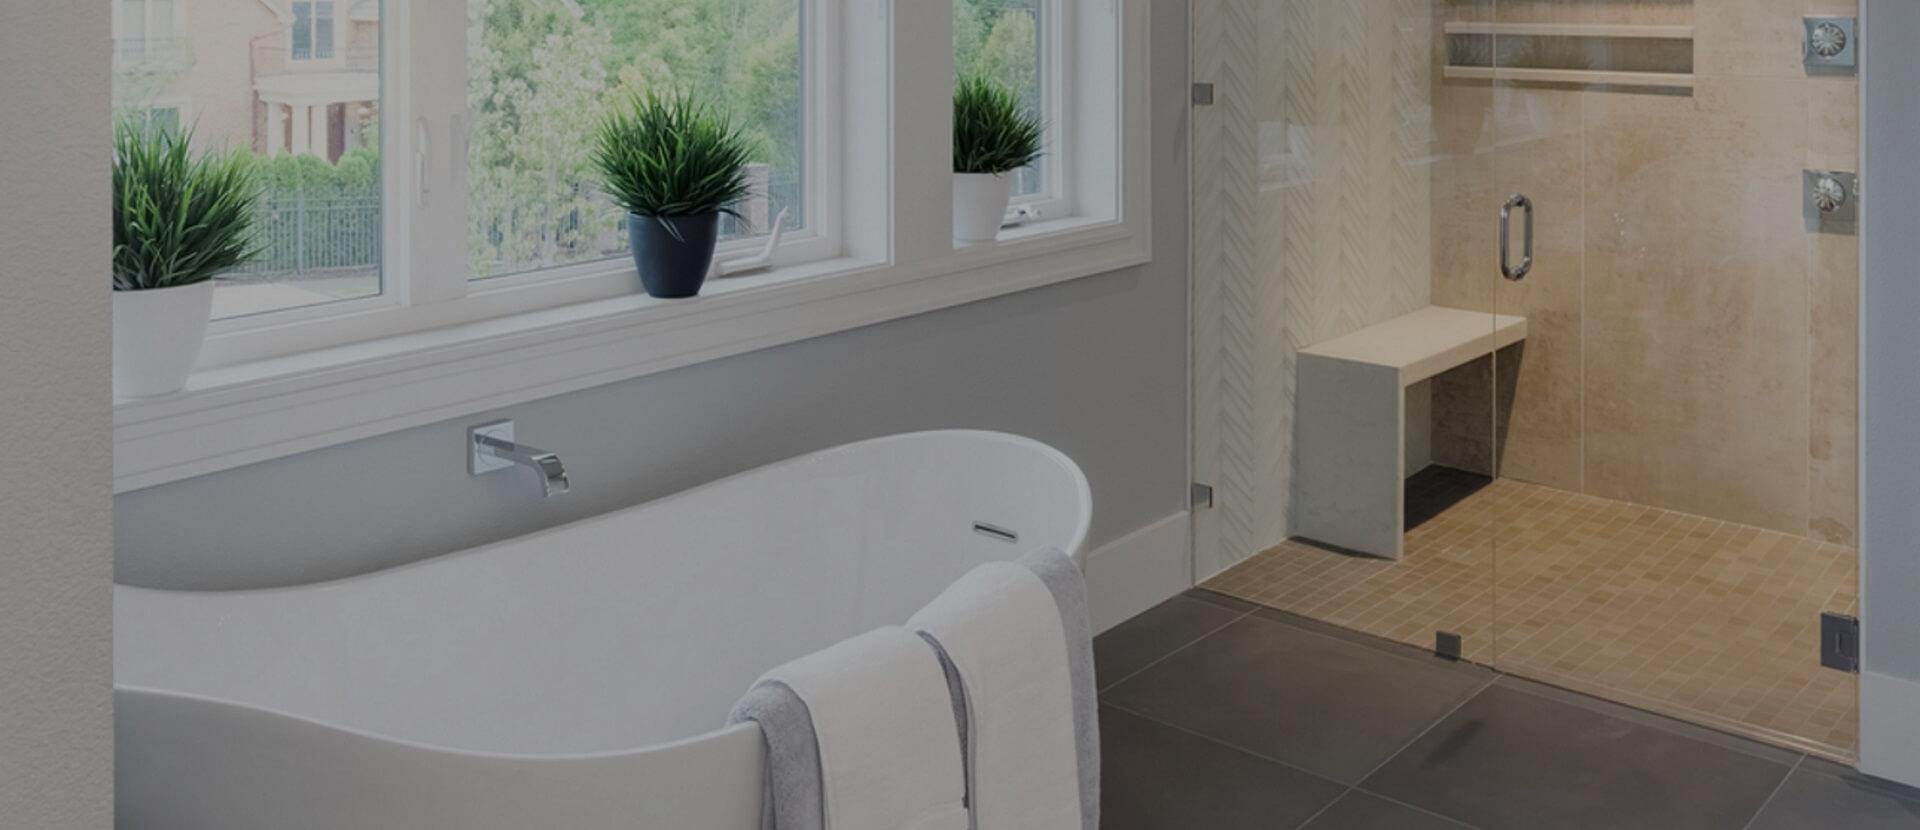 Cheap Sydney Bathroom Renovations